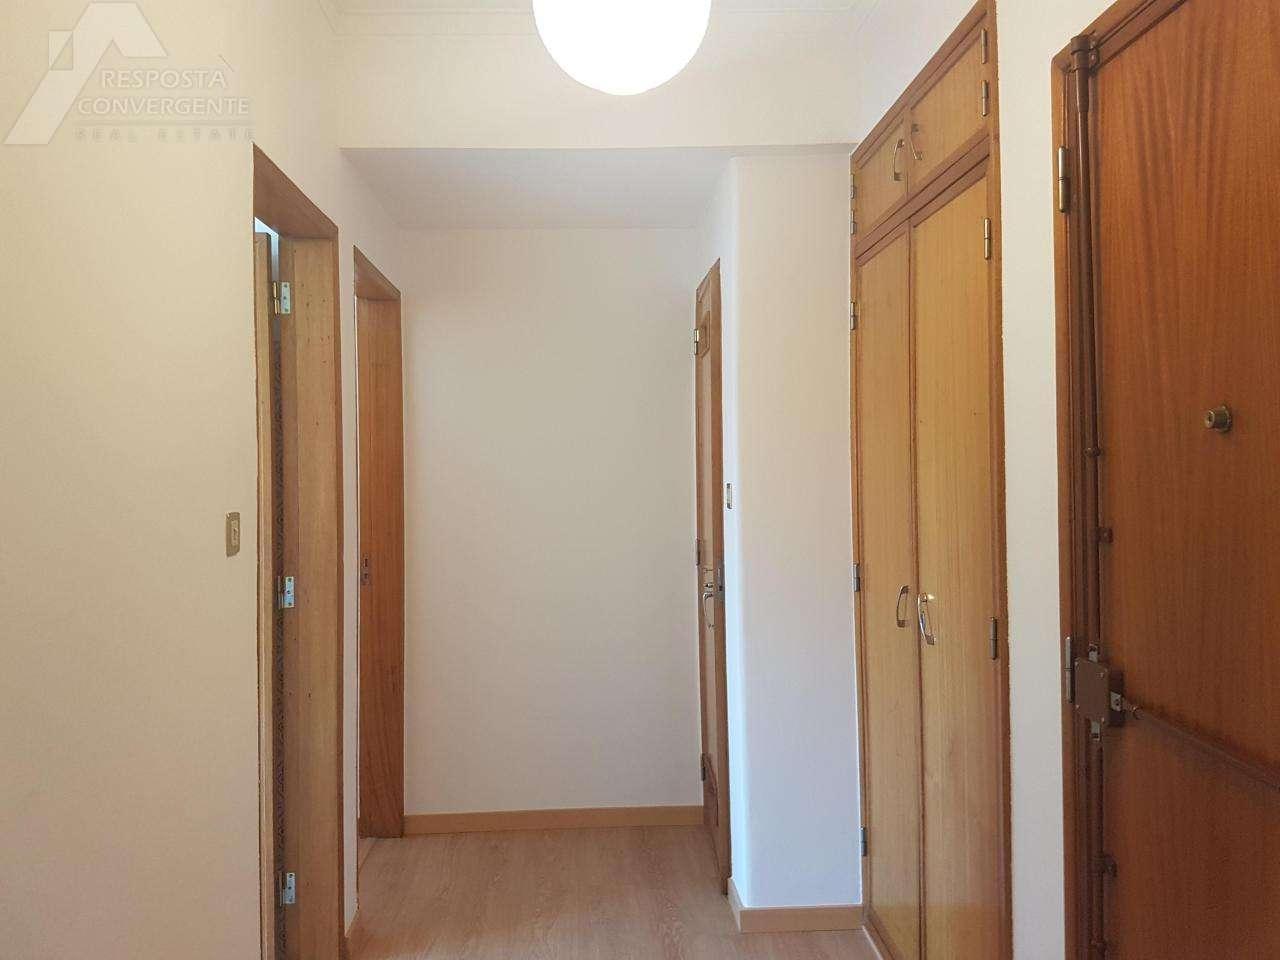 Apartamento para comprar, Queluz e Belas, Lisboa - Foto 11